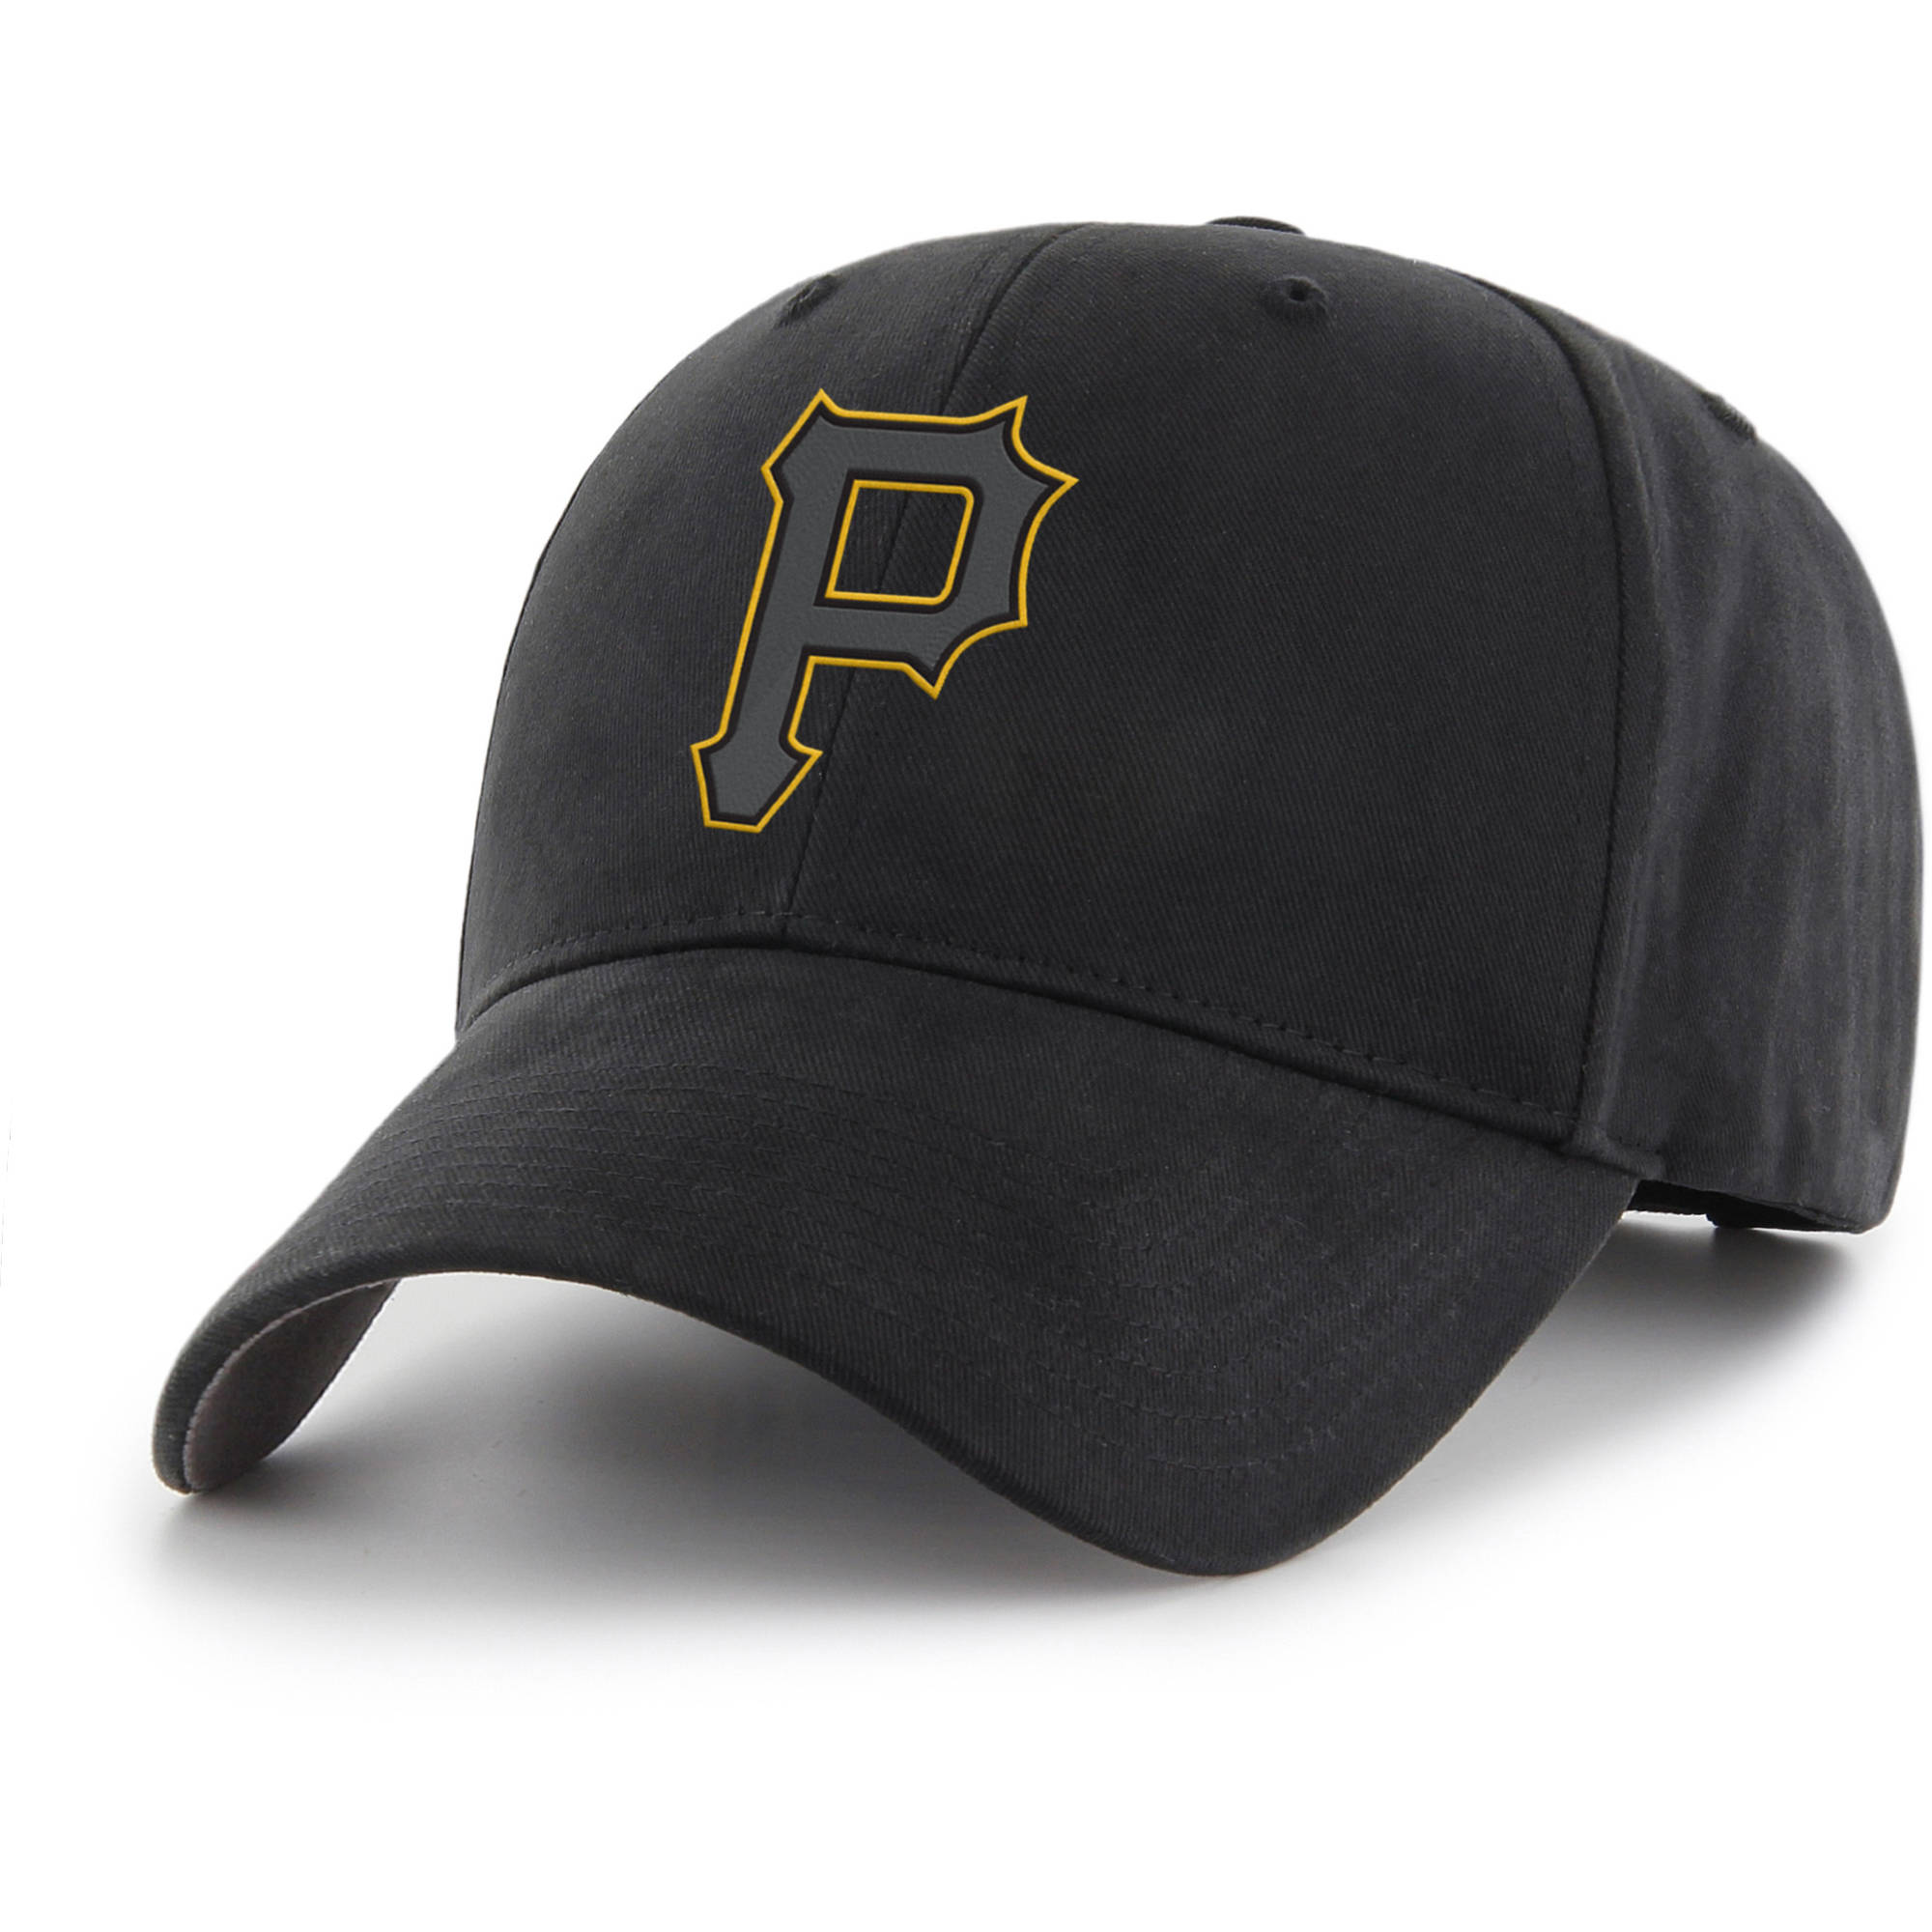 MLB Black Mass Basic Adjustable Cap/Hat by Fan Favorite